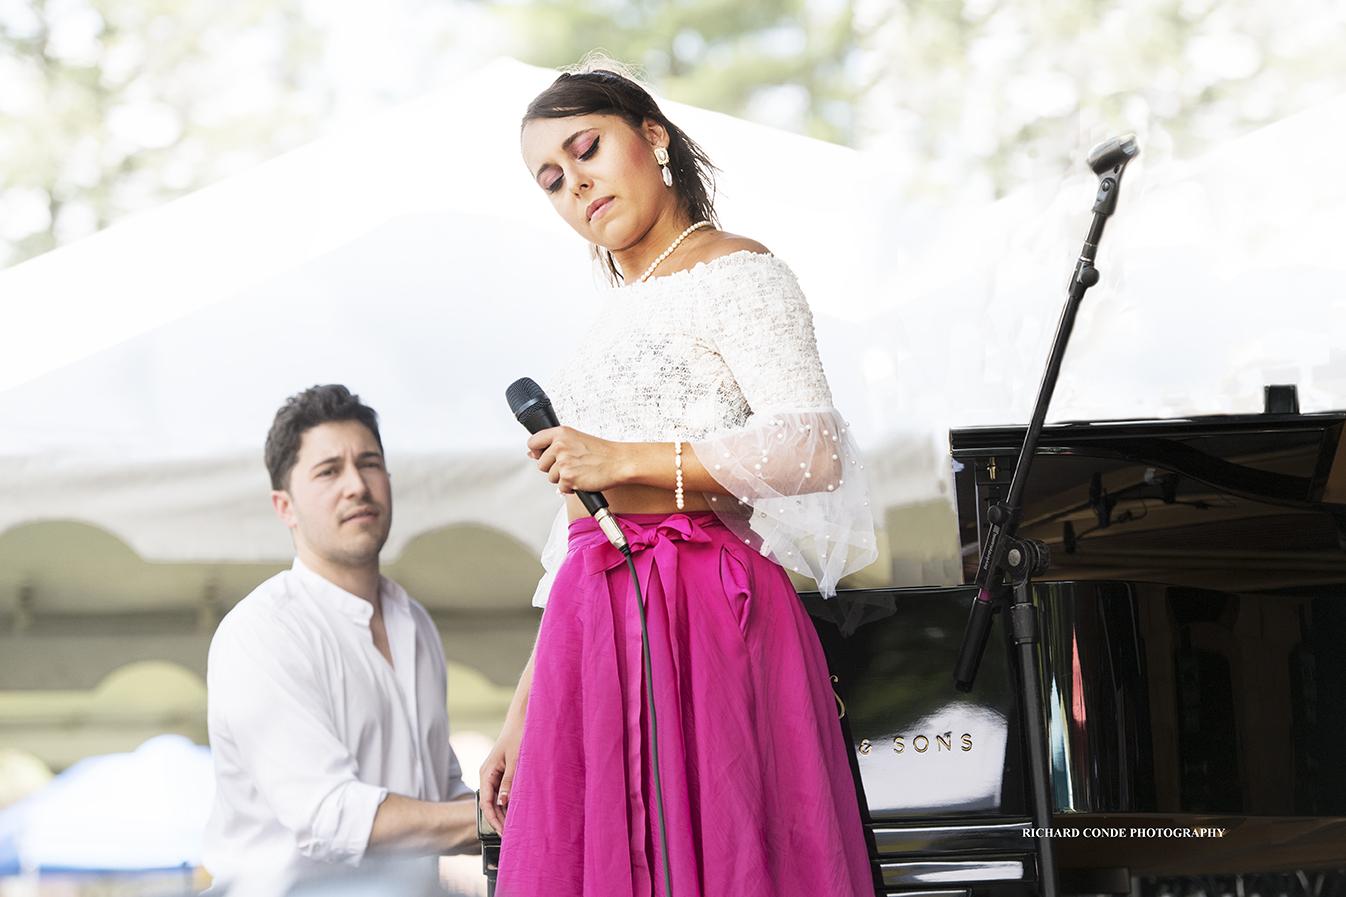 Veronica Swift at the Saratoga Jazz Festival